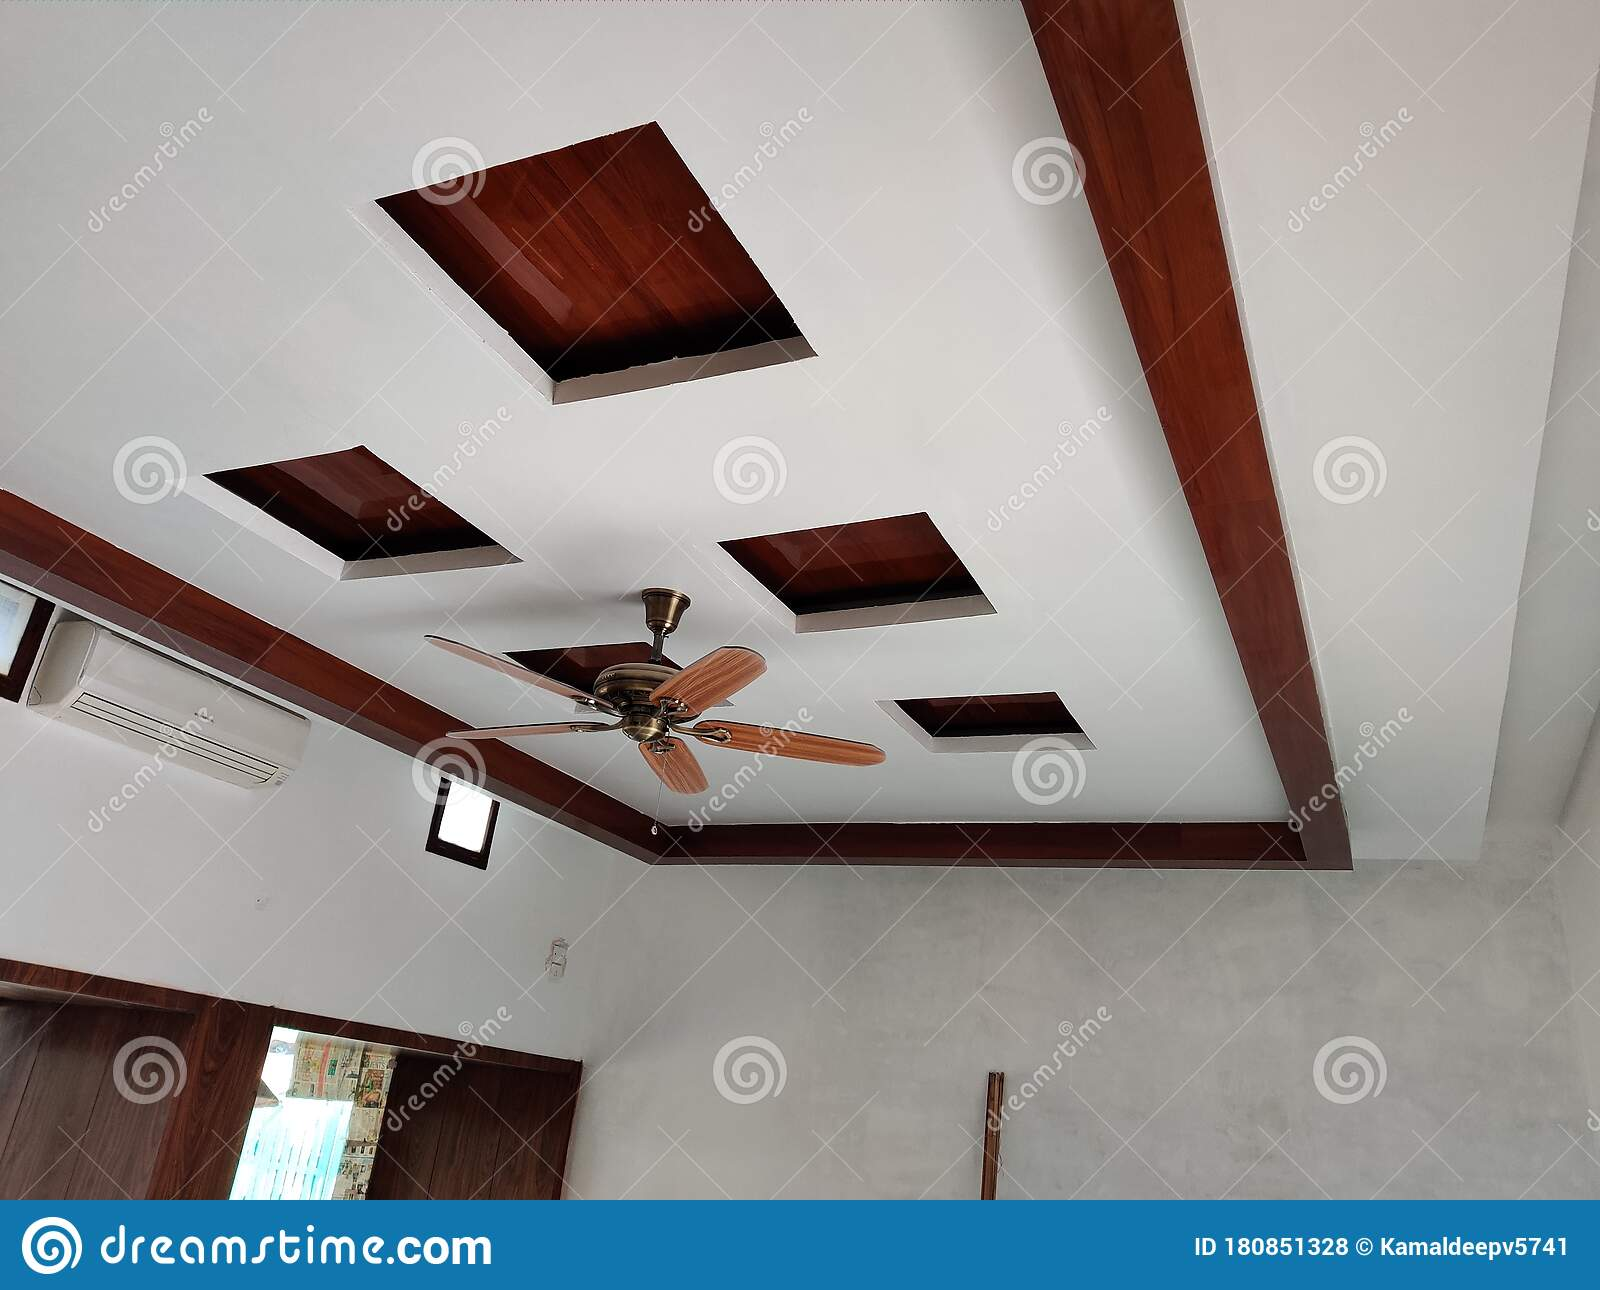 671 False Ceiling Photos Free Royalty Free Stock Photos From Dreamstime,Theme Civil Engineering Rangoli Designs